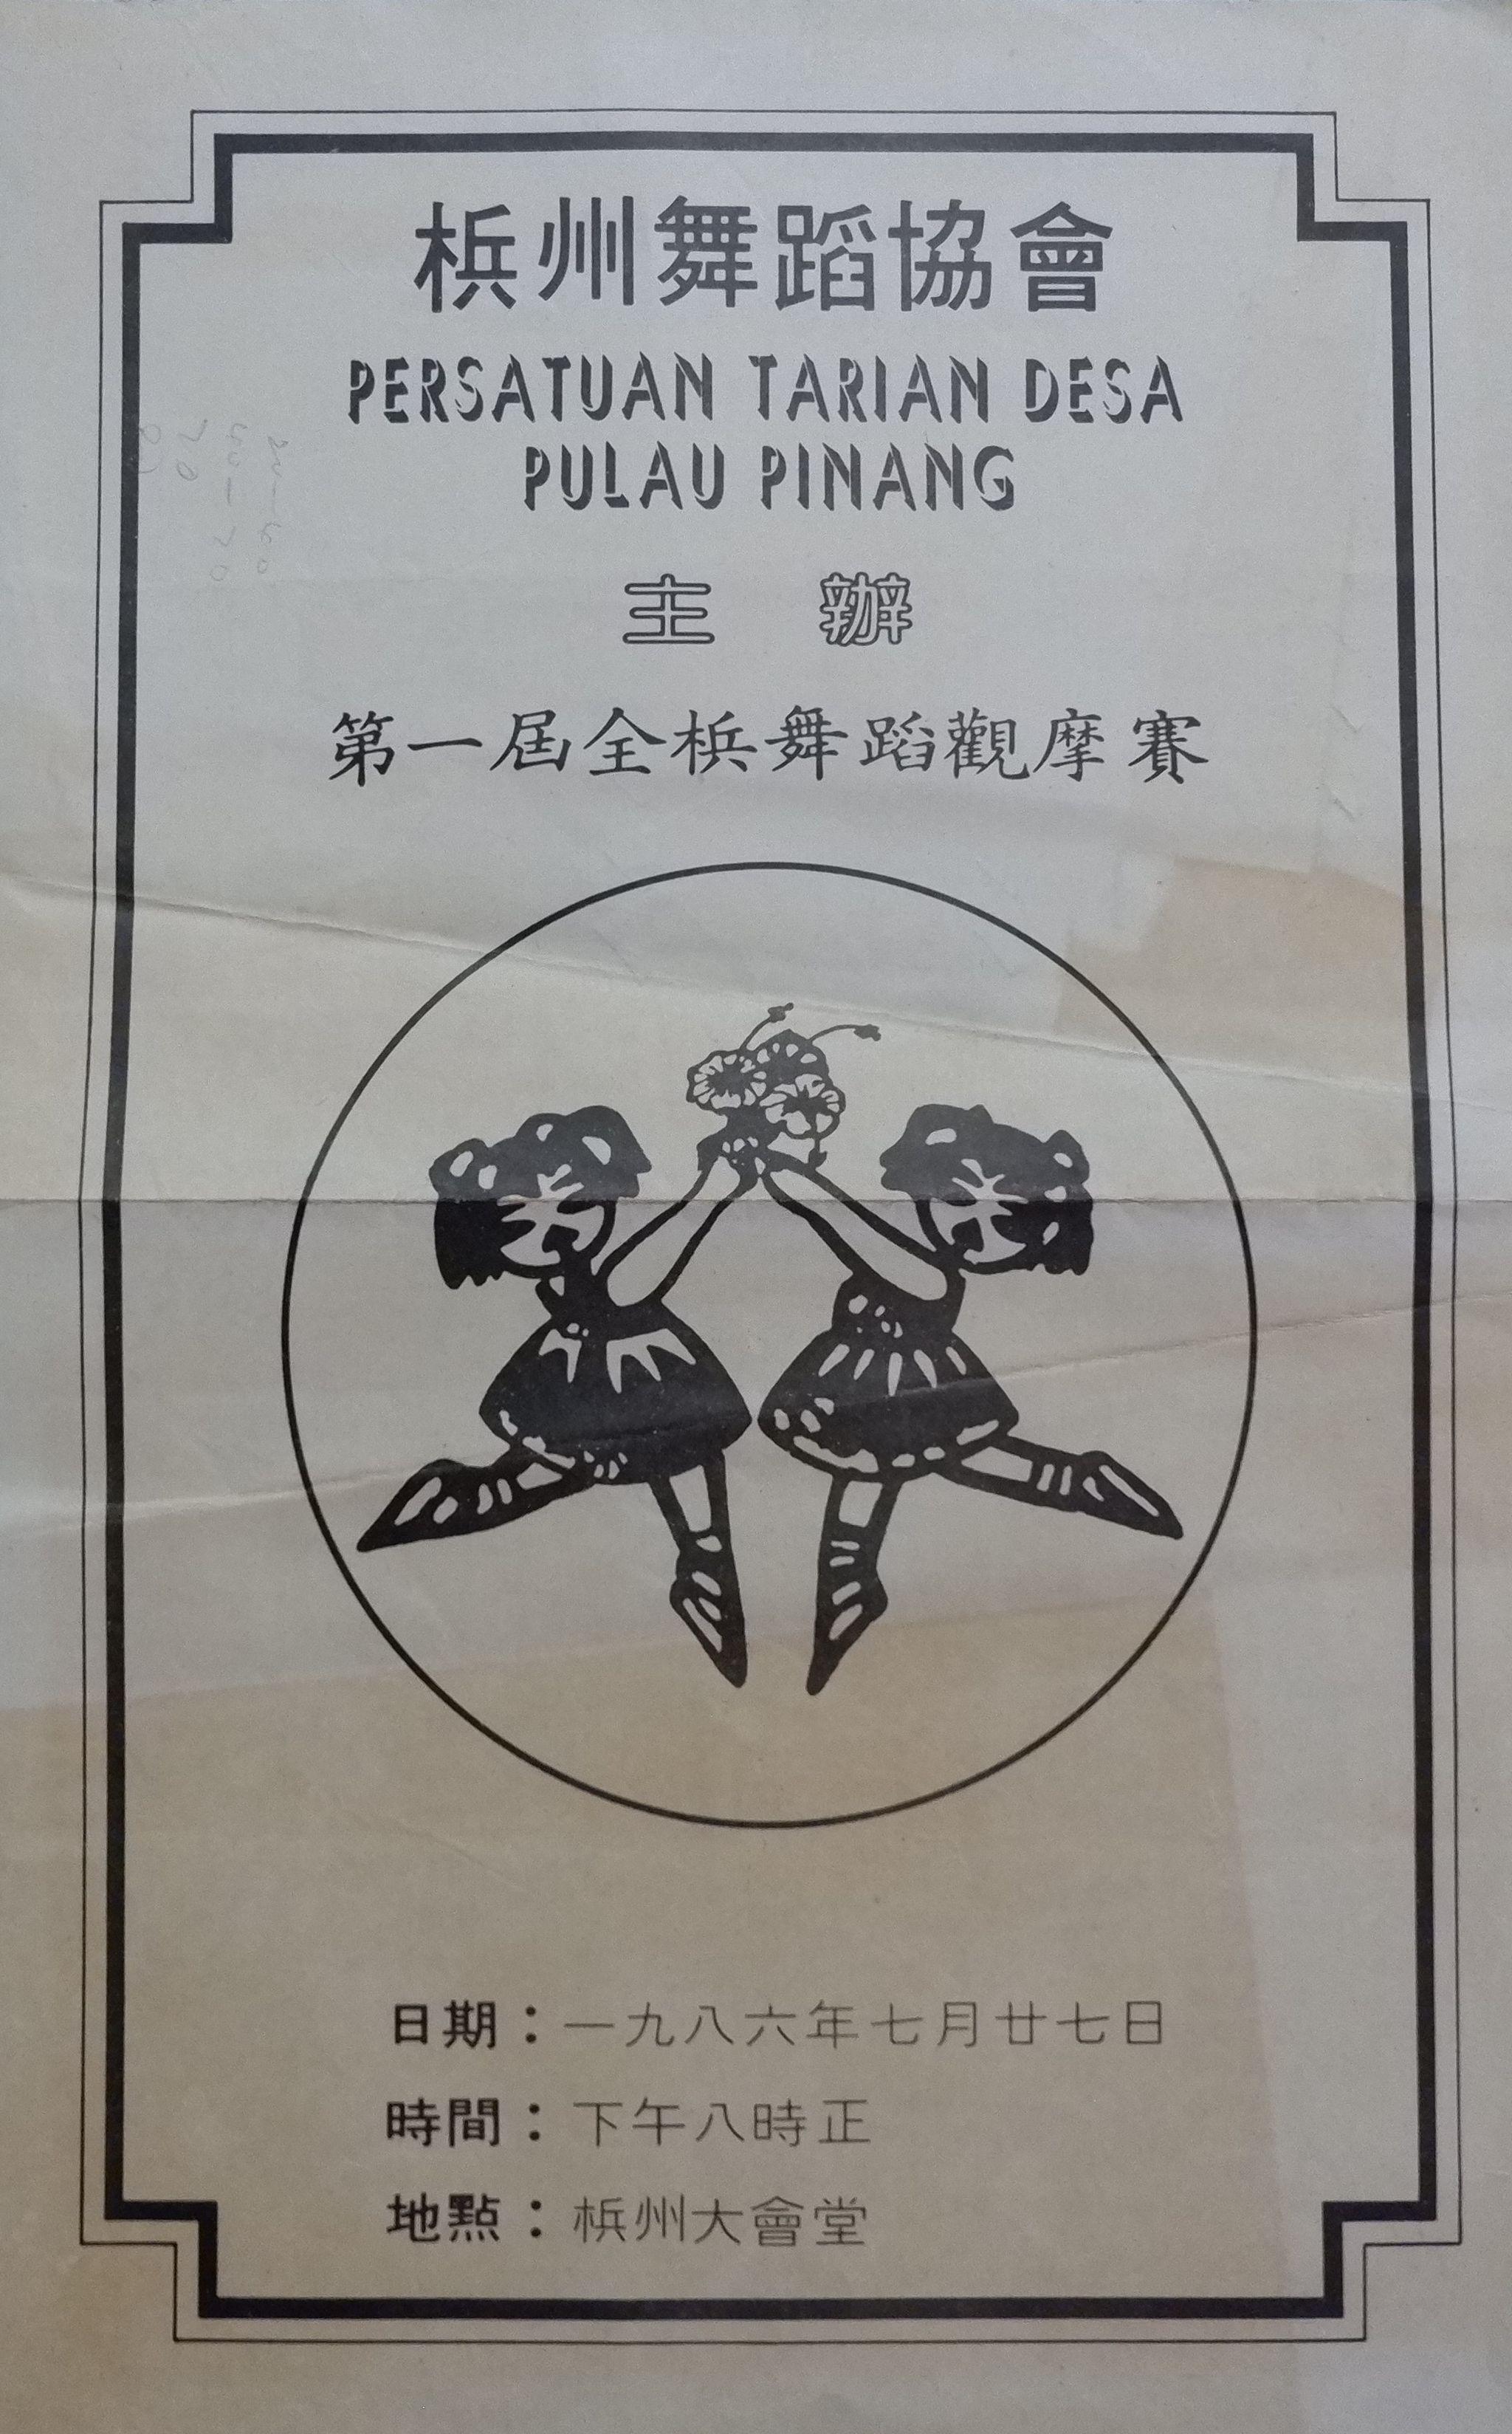 1986 Pesta Tarian 1 Pulau Pinang Cover